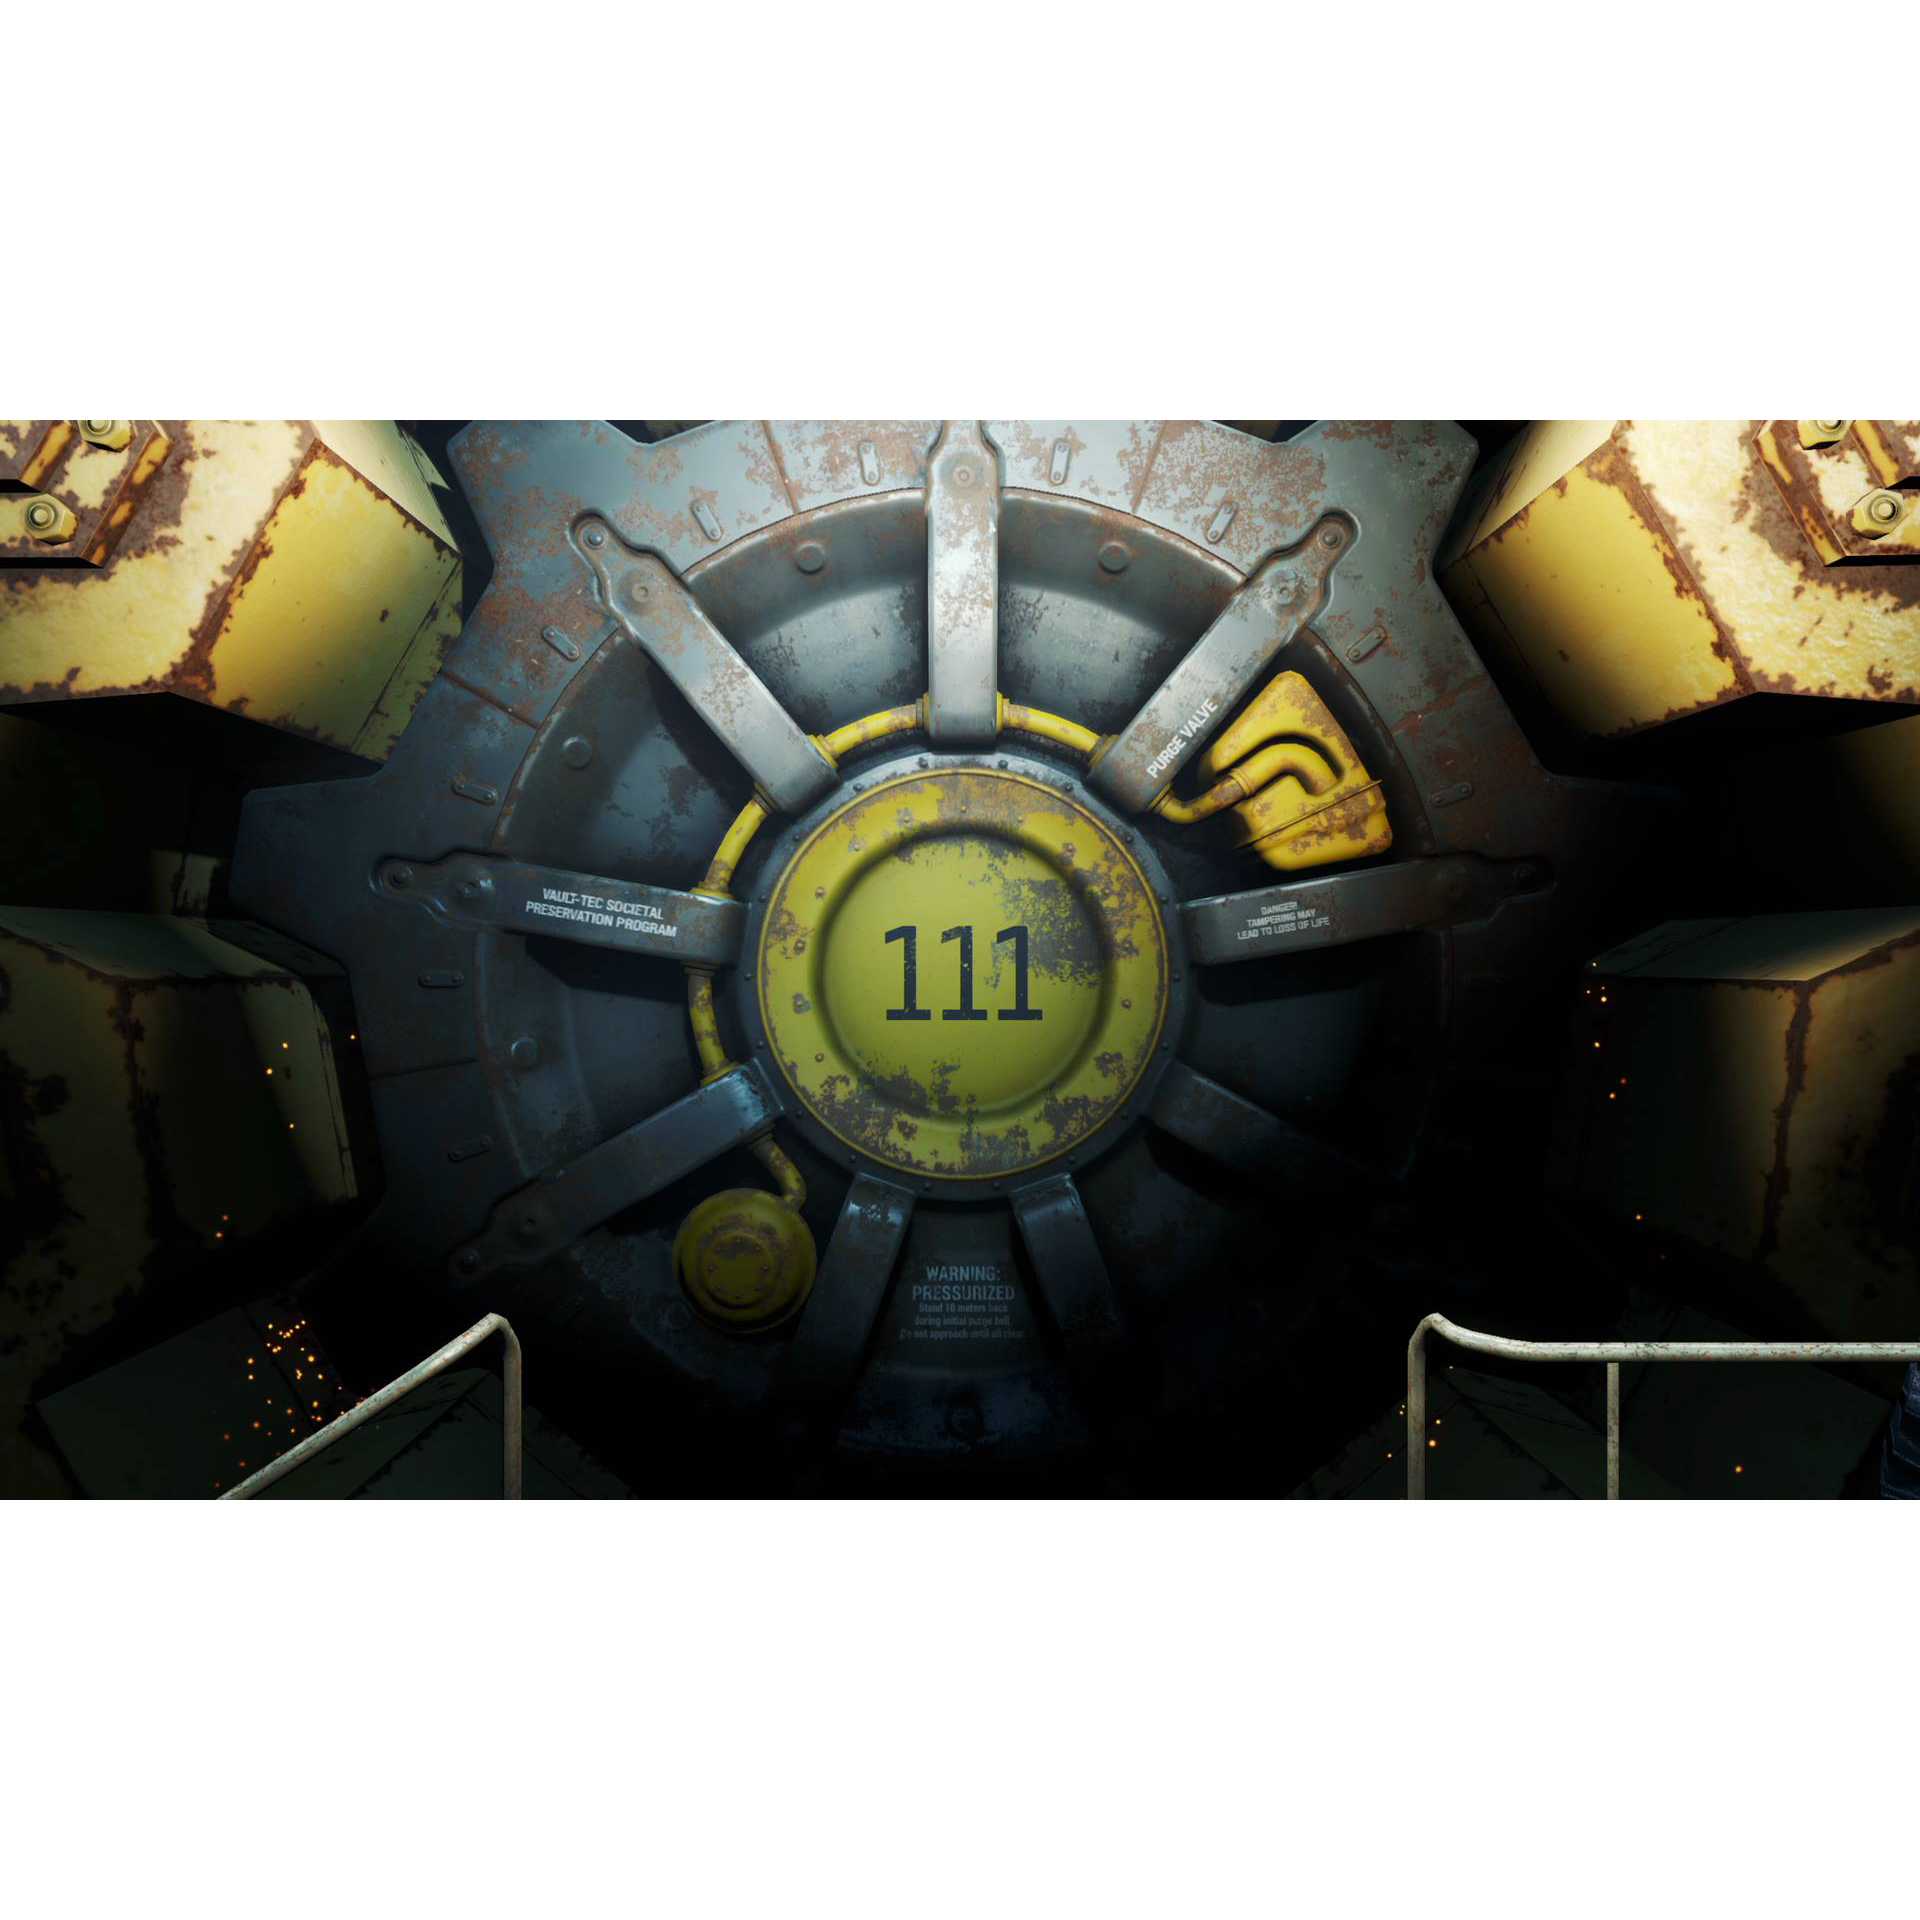 Joc Fallout 4 Goty pentru PlayStation 4 23